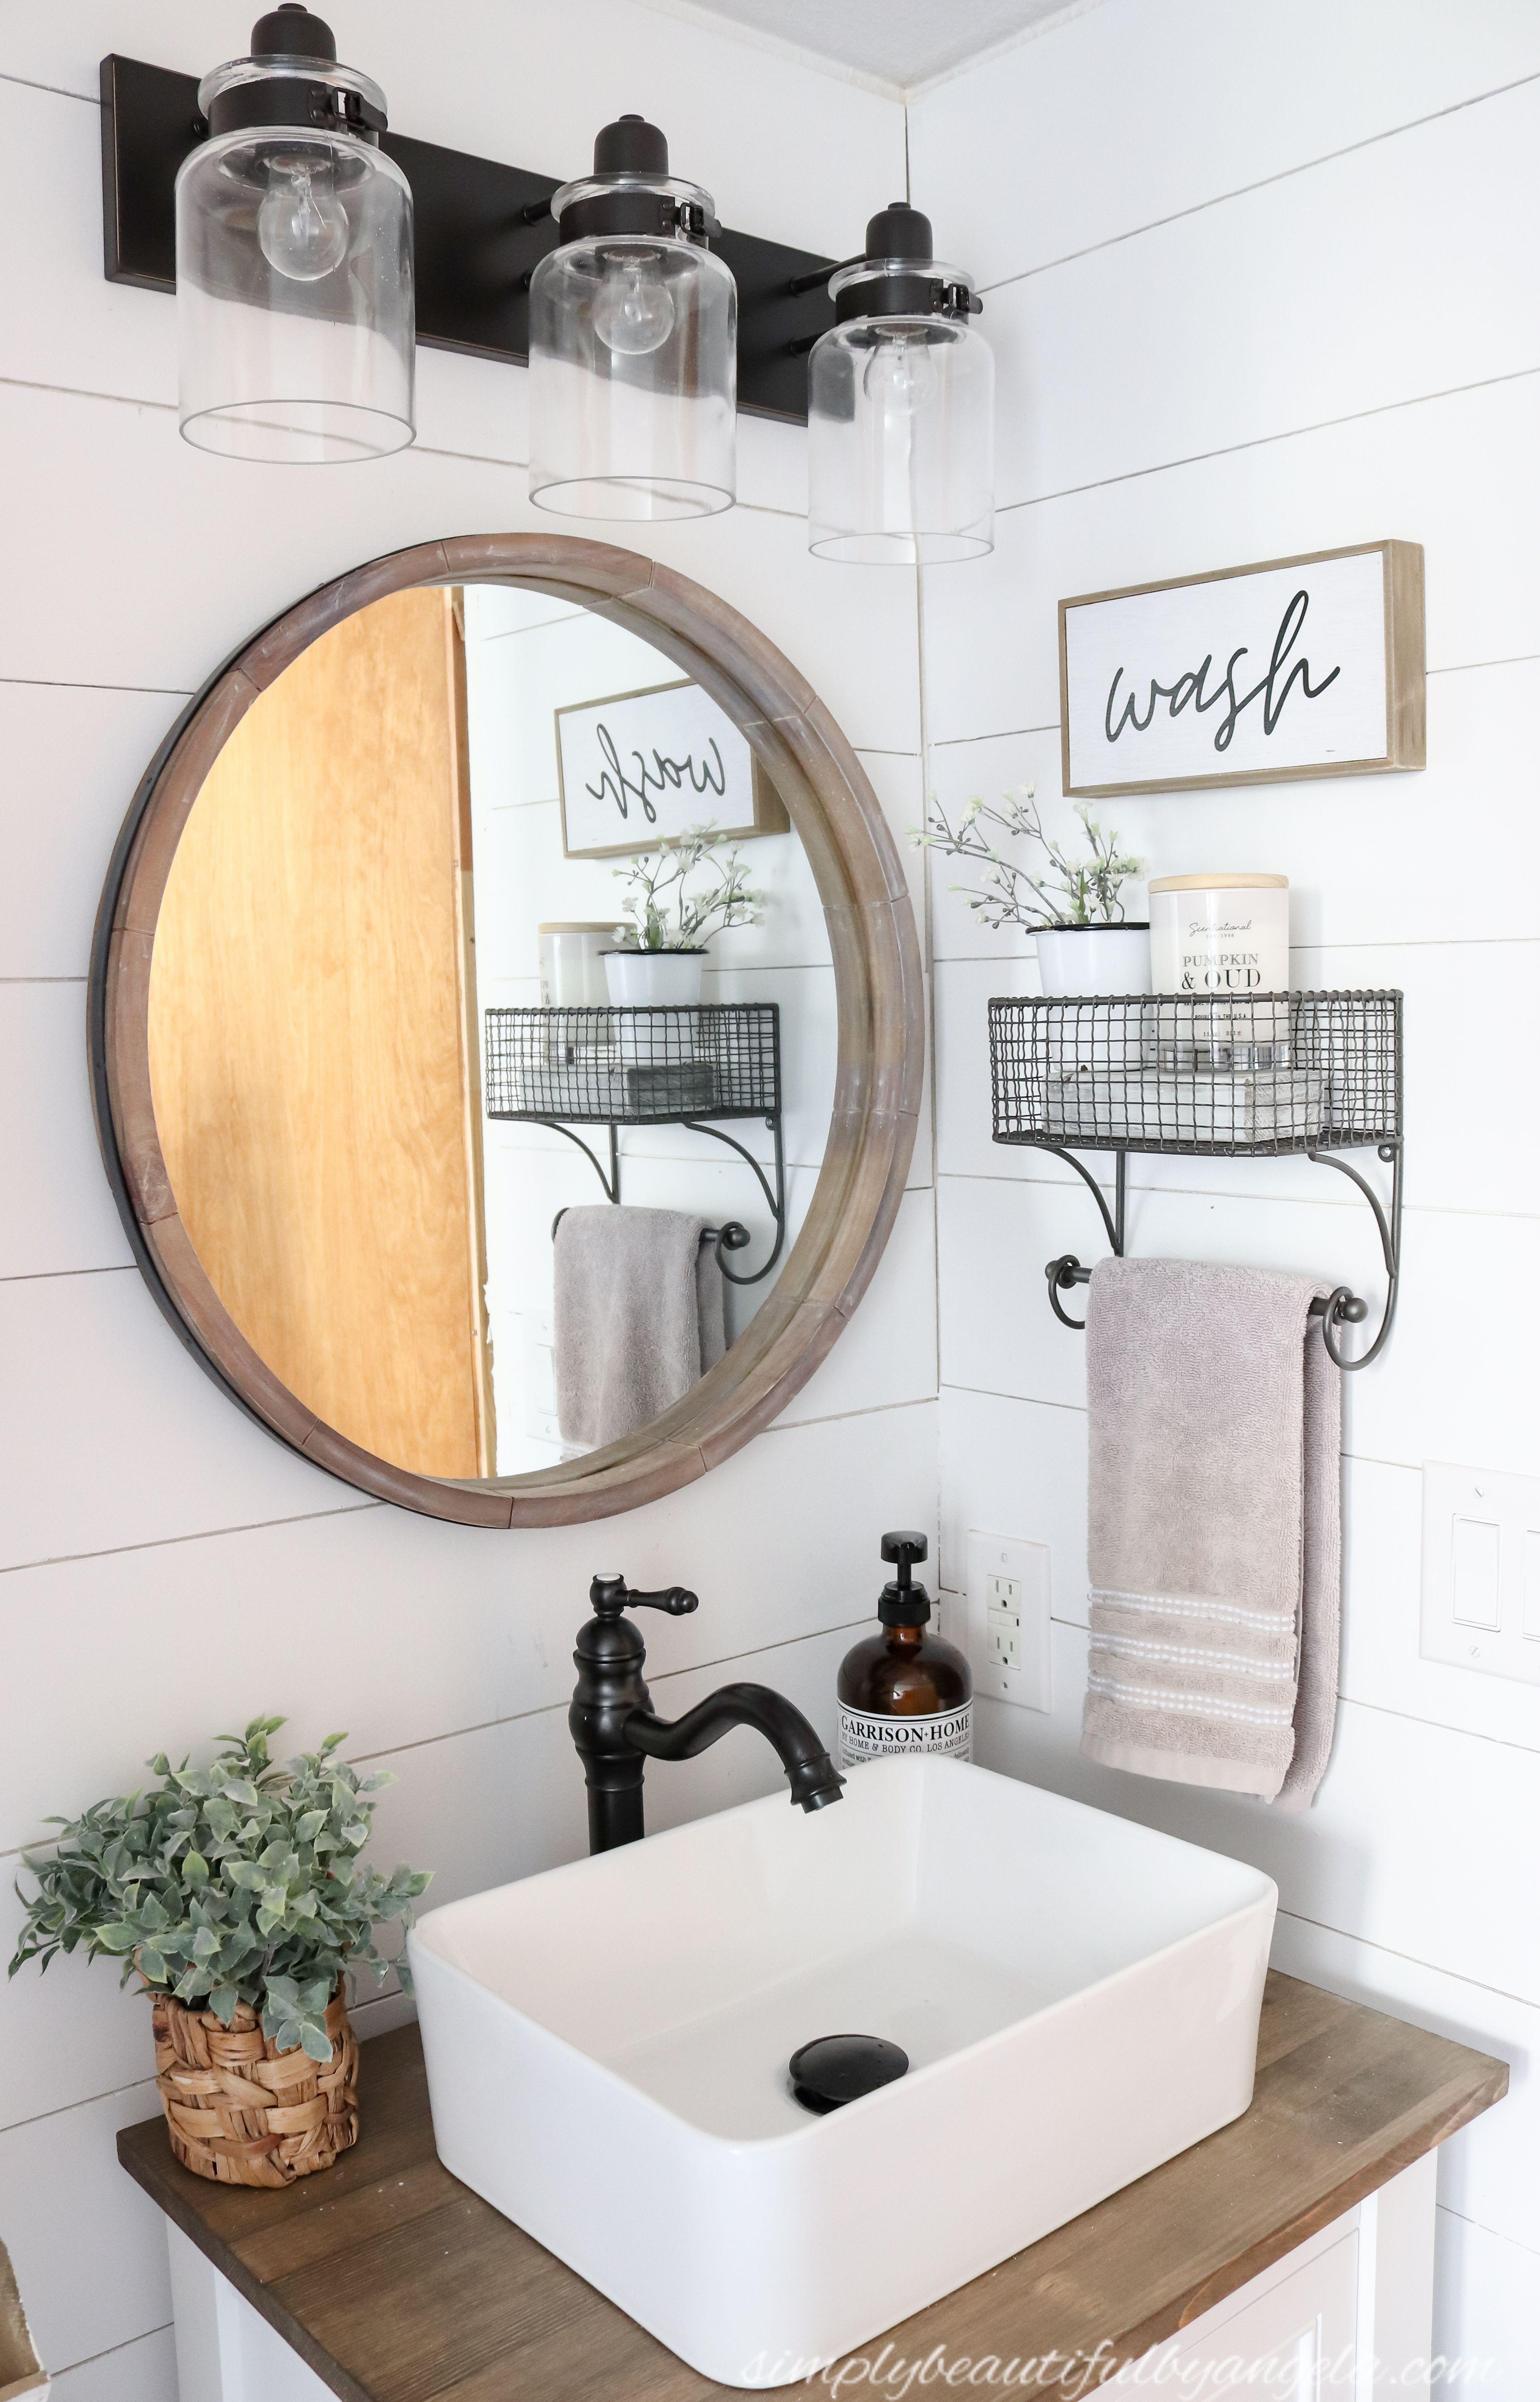 how to install a vanity vessel sink combo simply beautiful by angela roundvesselbat badezimmer dekor kleines badezimmer umgestalten kleines bad dekorieren